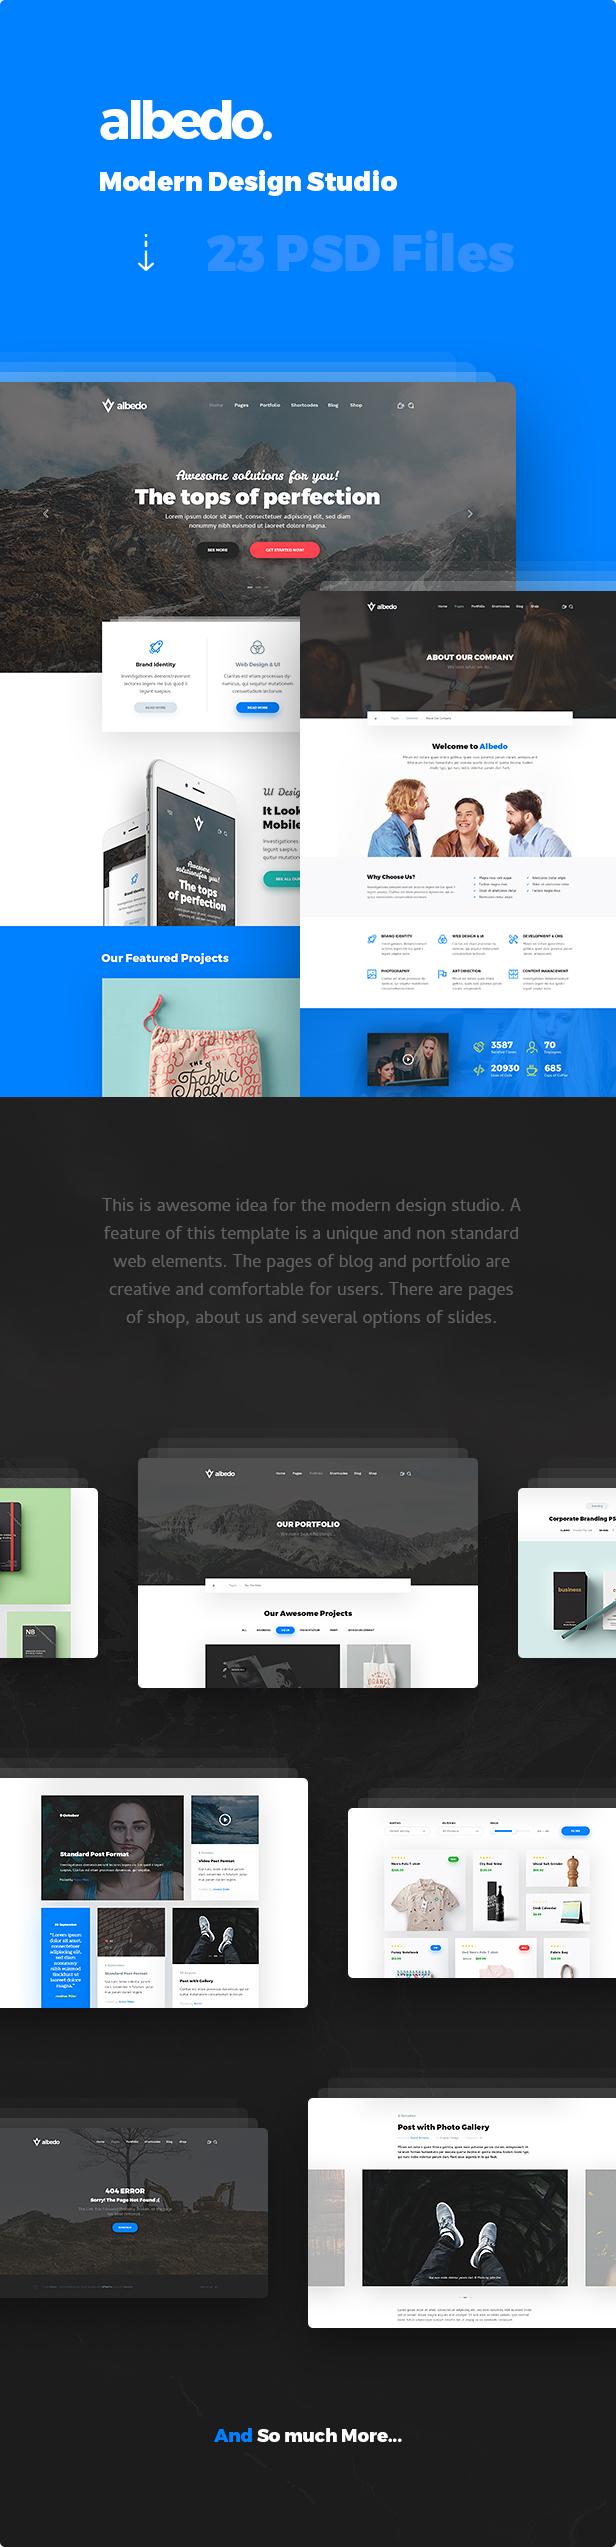 Albedo - Modern Design Studio PSD Template #design studio #material design #modern